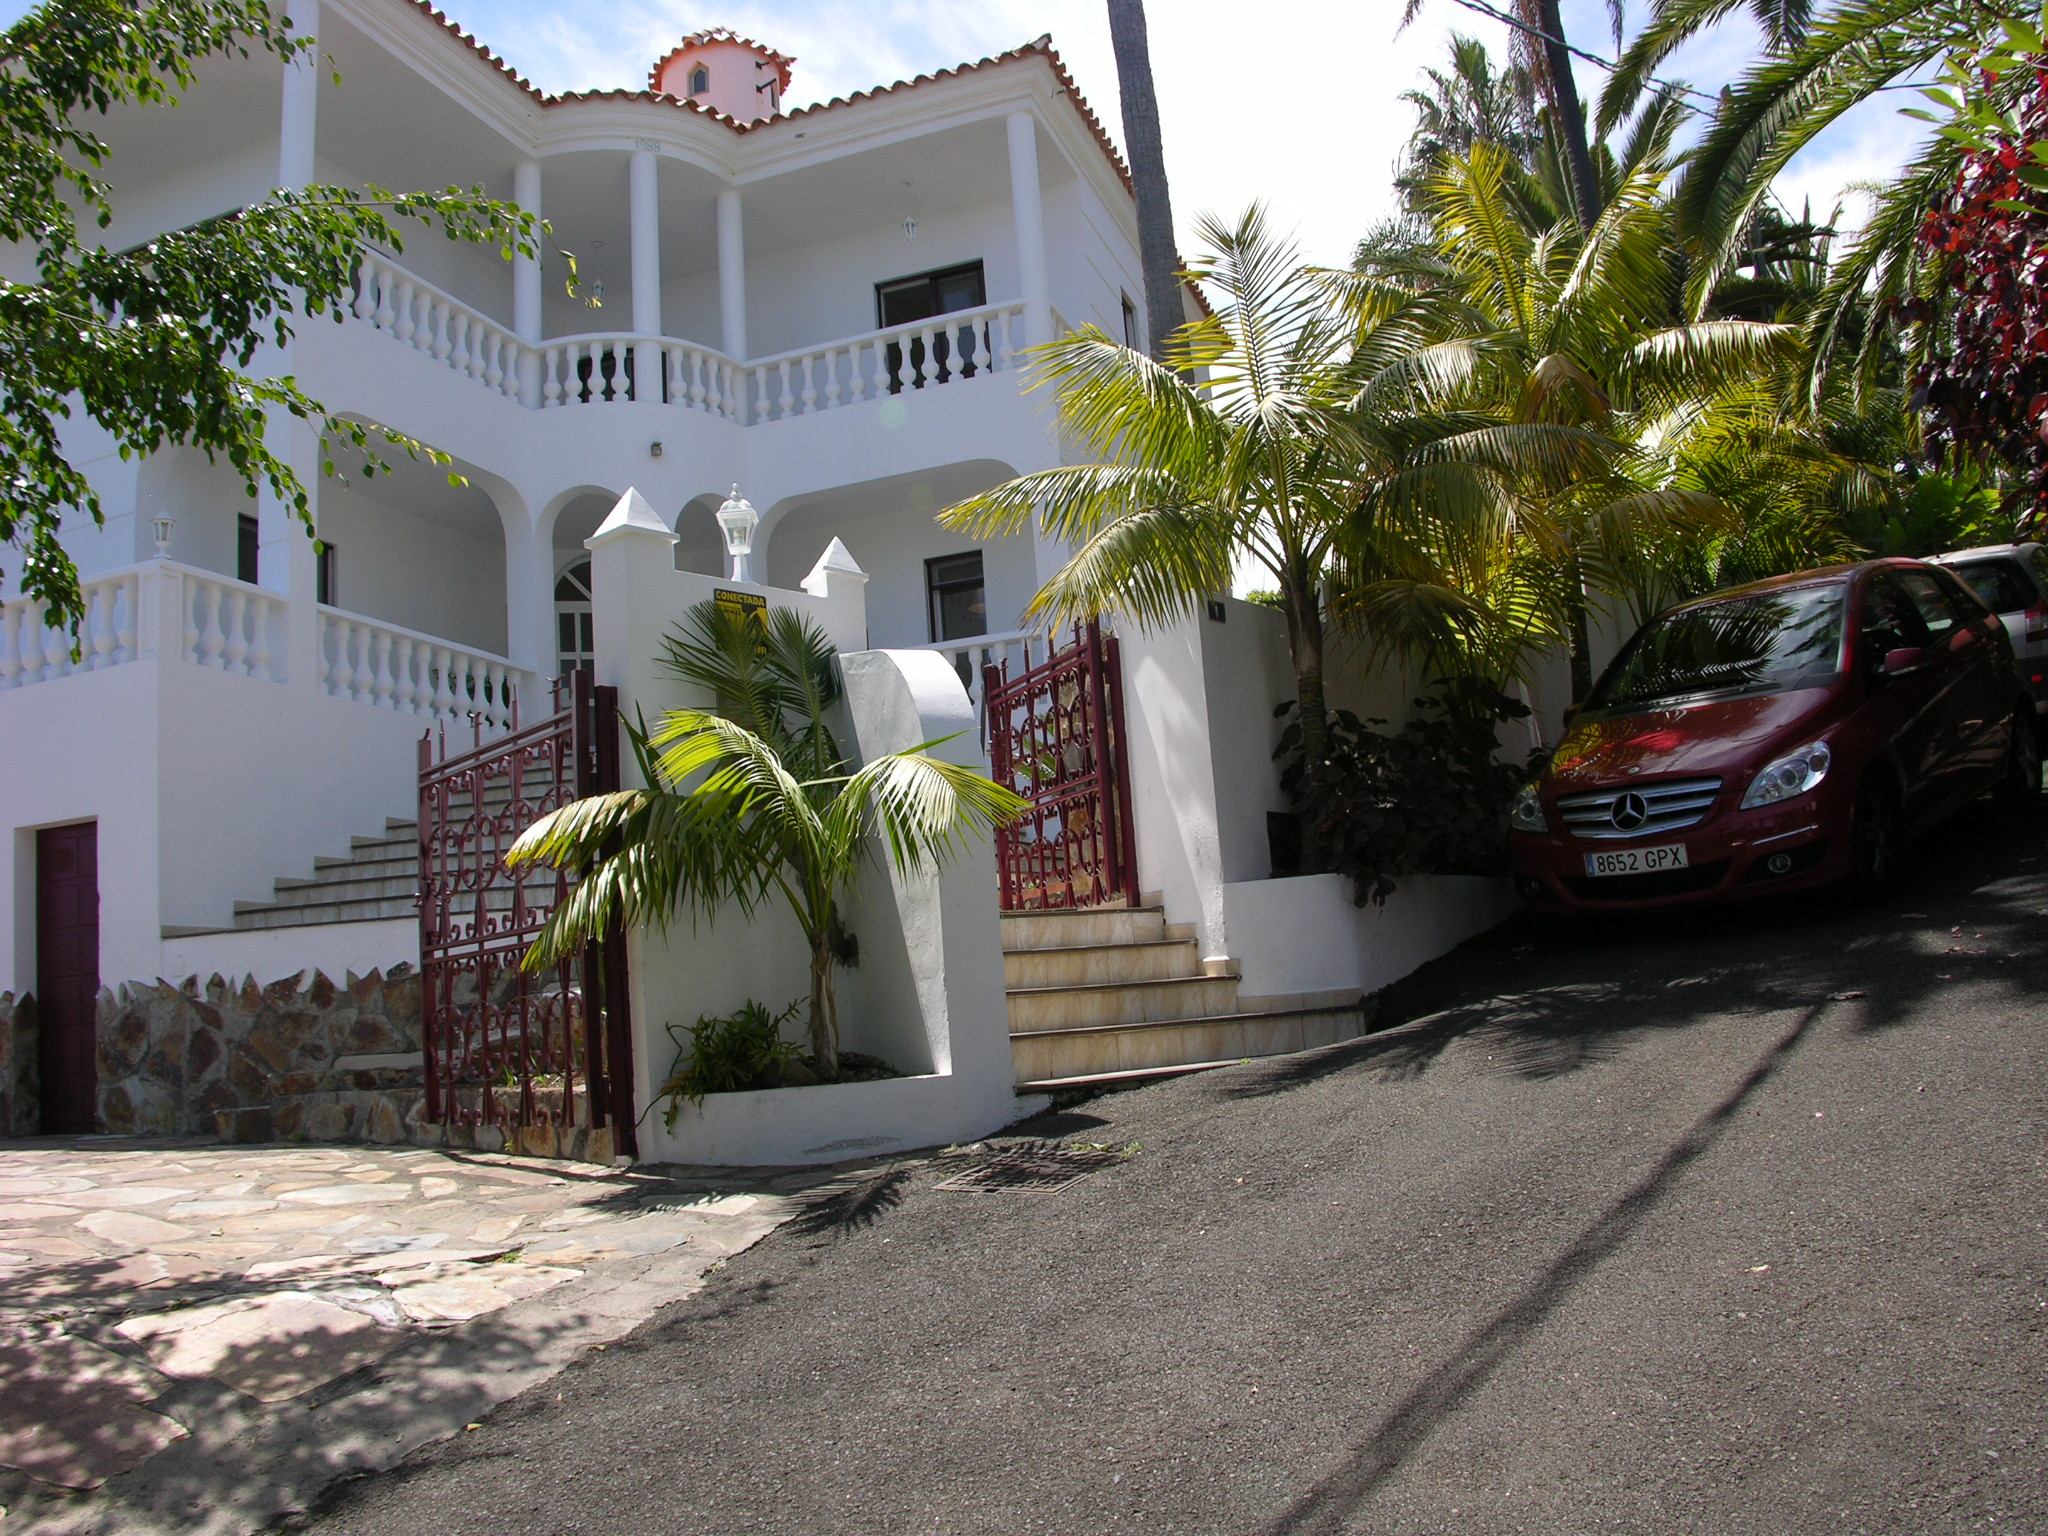 Maison de vacances Villa Vista La Quinta beheizbarer Pool kostenloses WLAN Grill (2124407), Santa Ursula, Ténérife, Iles Canaries, Espagne, image 57